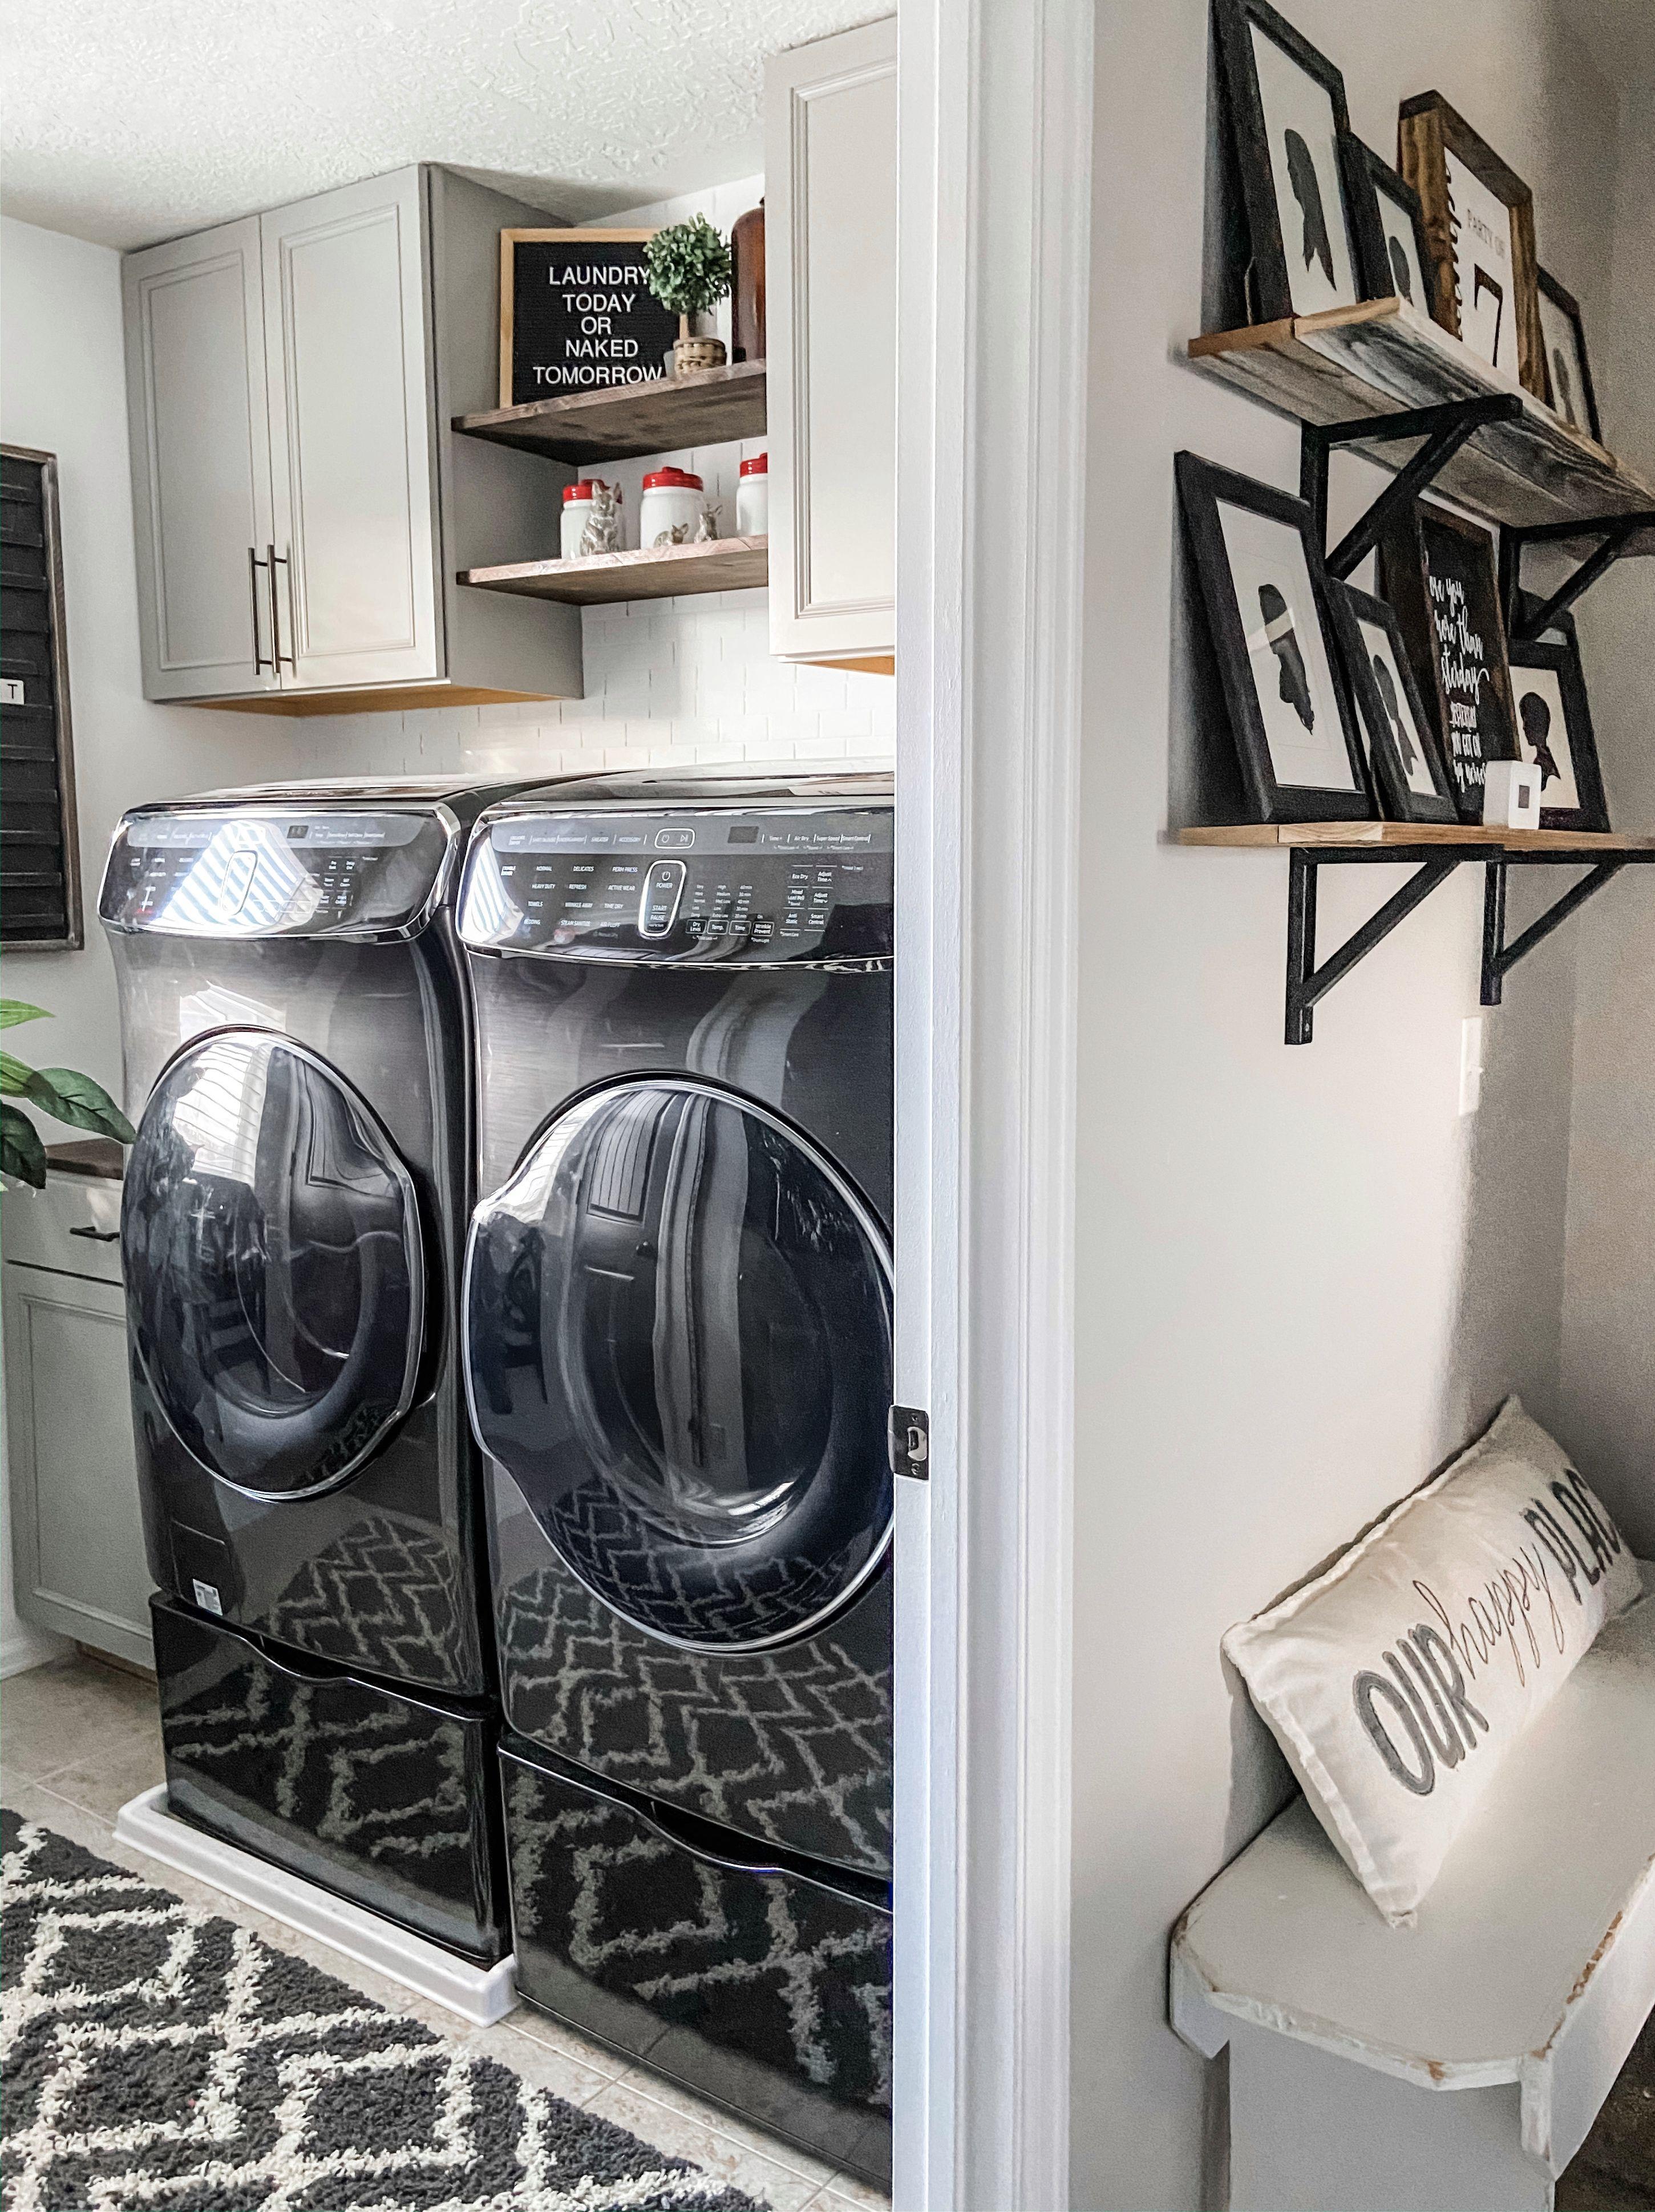 6 0 Cu Ft Flexwash Washer In Black Stainless Steel Washer Wv60m9900av A5 Samsung Us Laundry Room Design Laundry Room Storage Laundry Room Storage Shelves